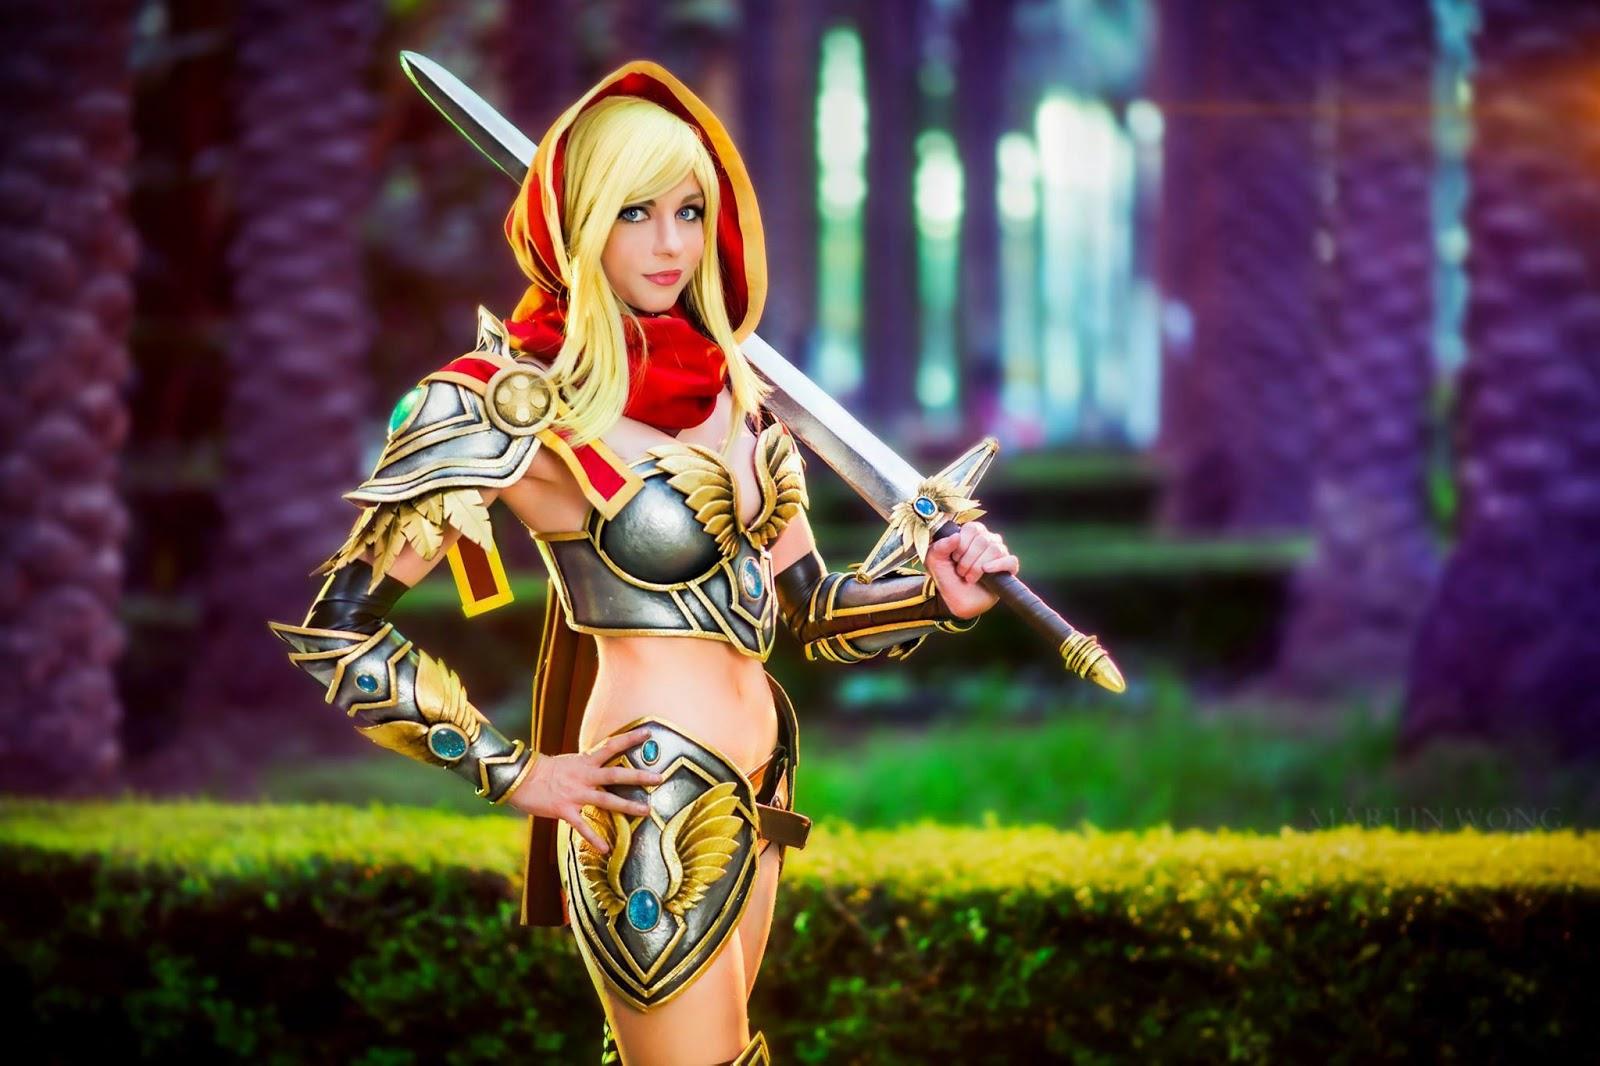 elArte Cosplay: World of Warcraft - Paladin Cosplay